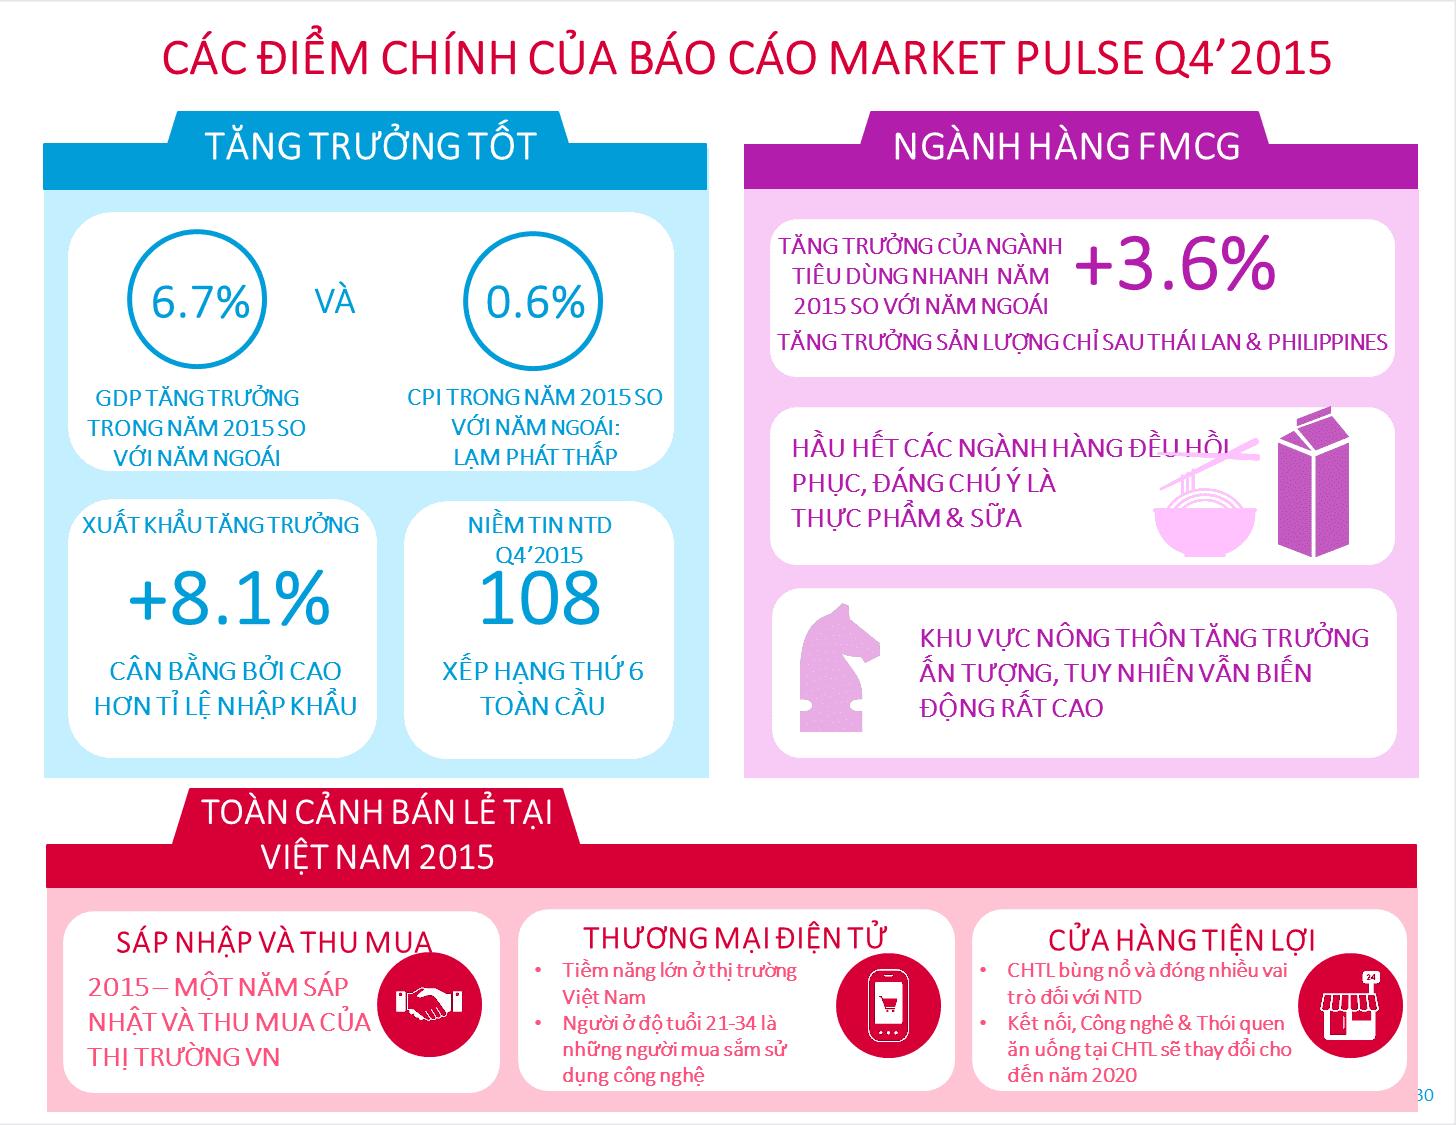 Summary_Market Pulse Q4'2015 -VIET